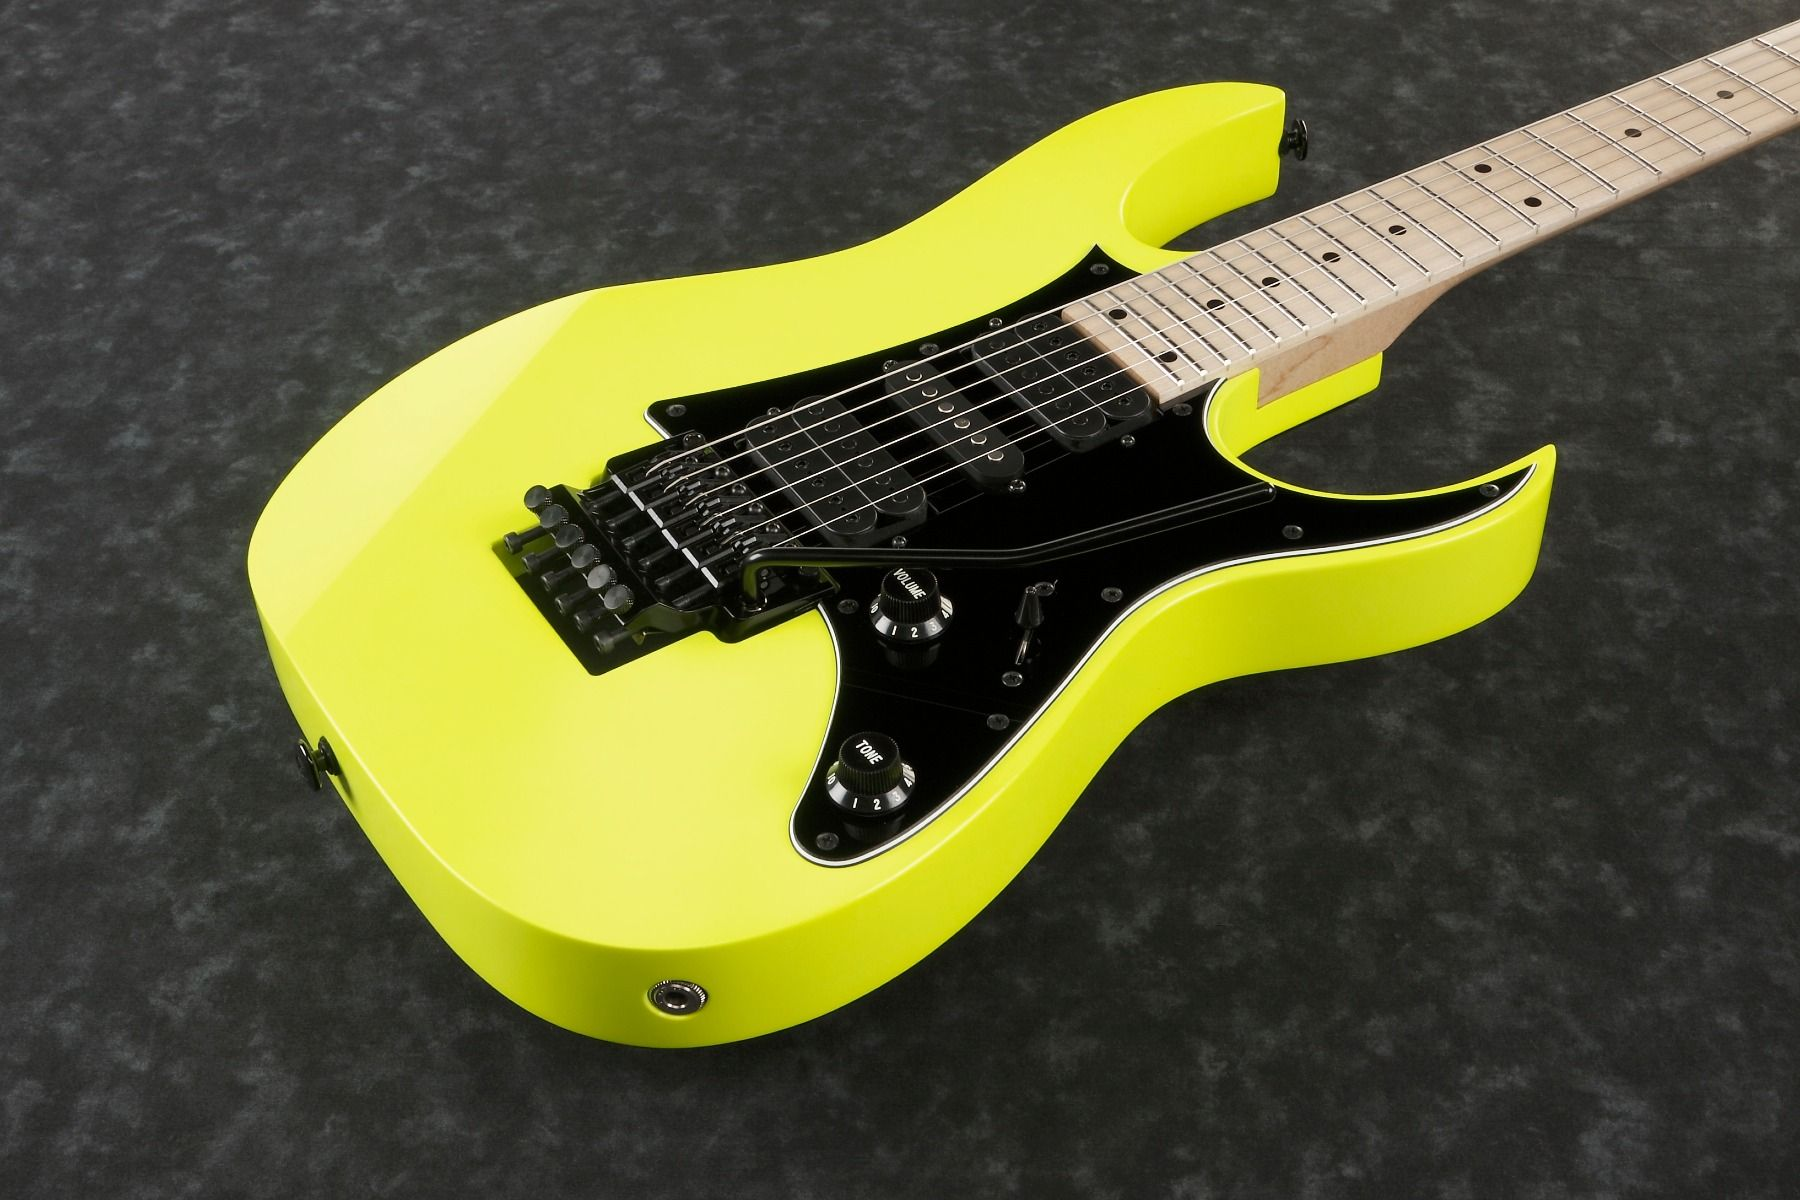 Ibanez RG Genesis Collection Desert Sun Yellow RG550 DY Electric Guitar